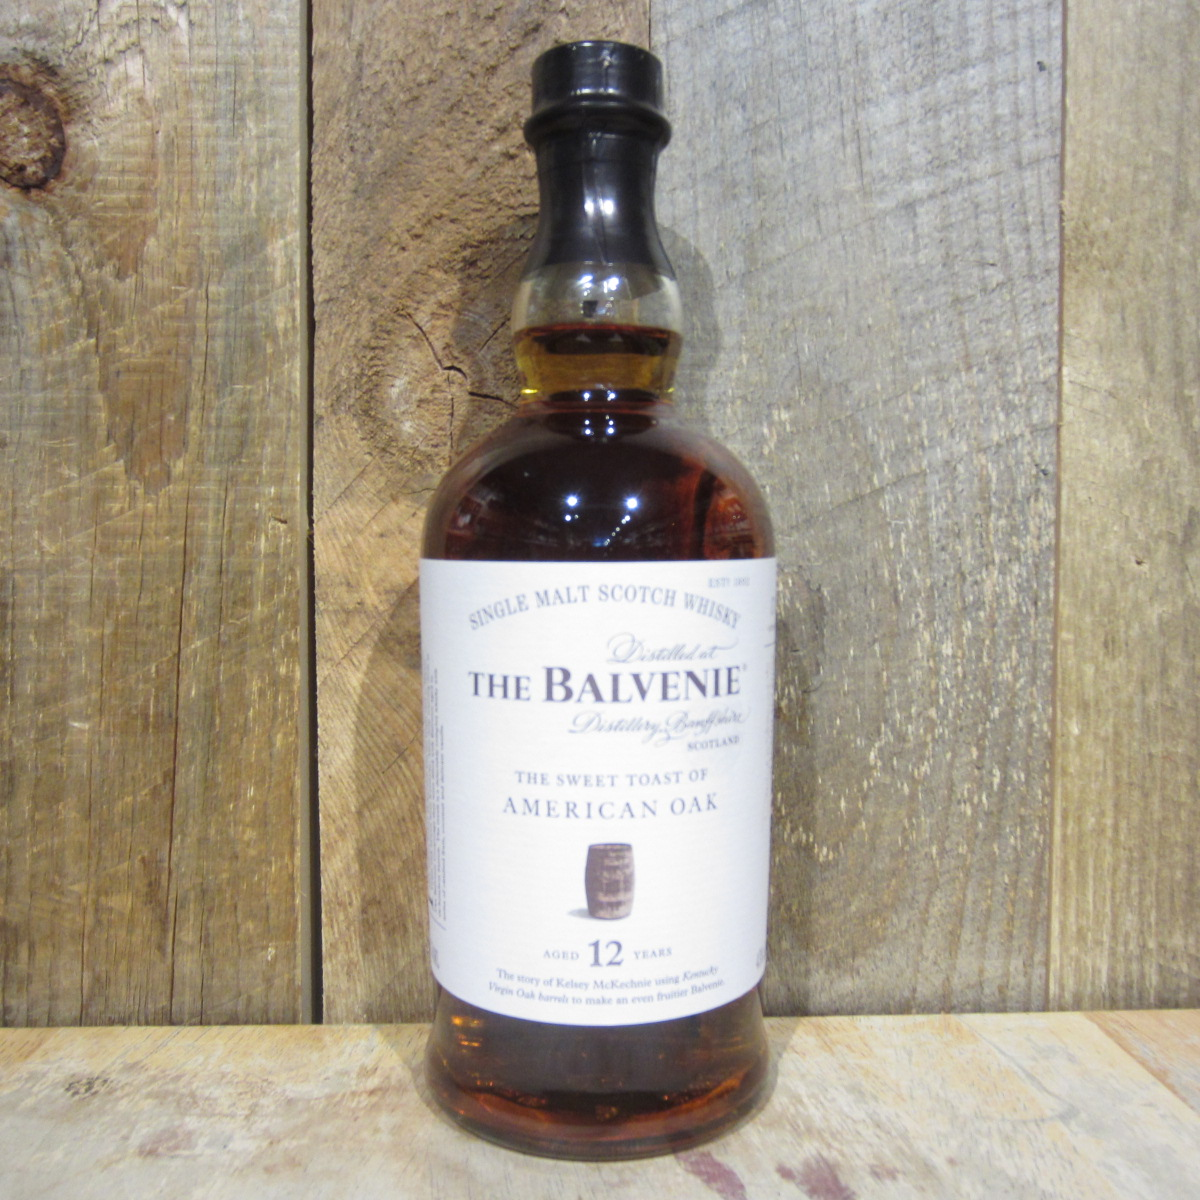 Balvenie Sweet Toast of American Oak 12 Year 750ml